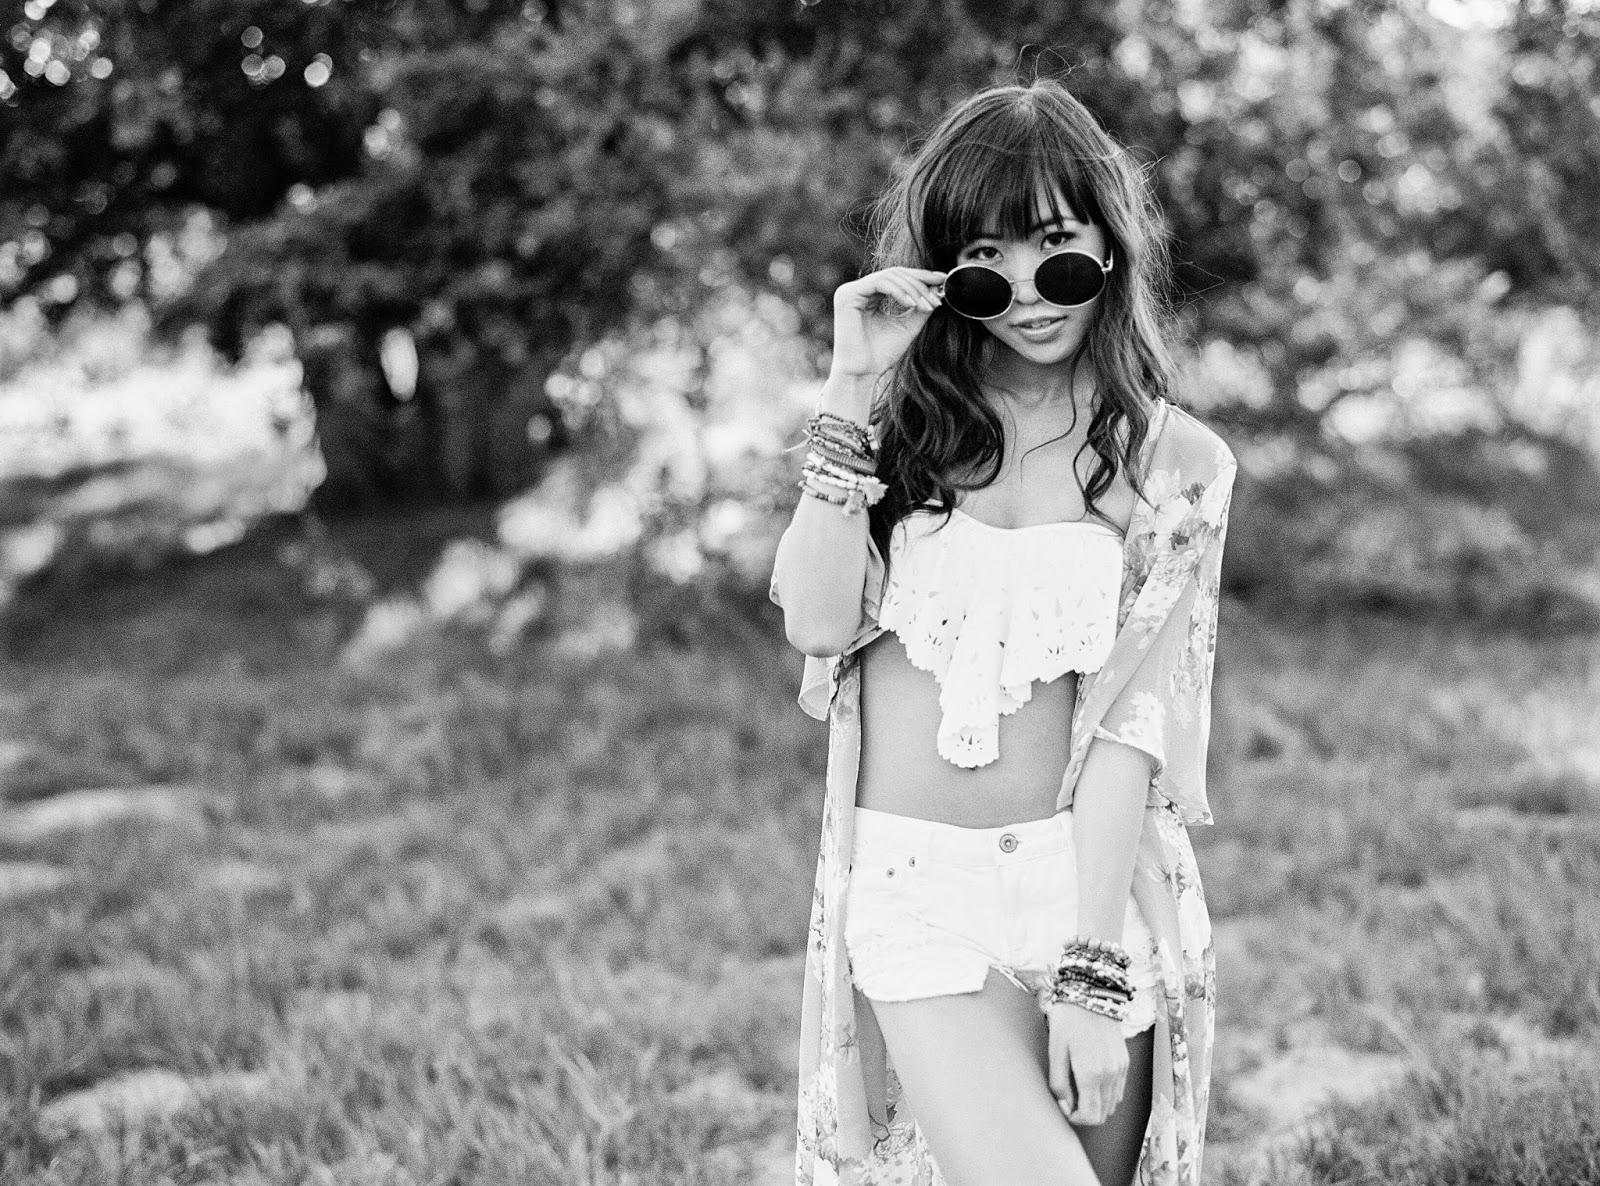 Moon_On_Mars_Summer_7